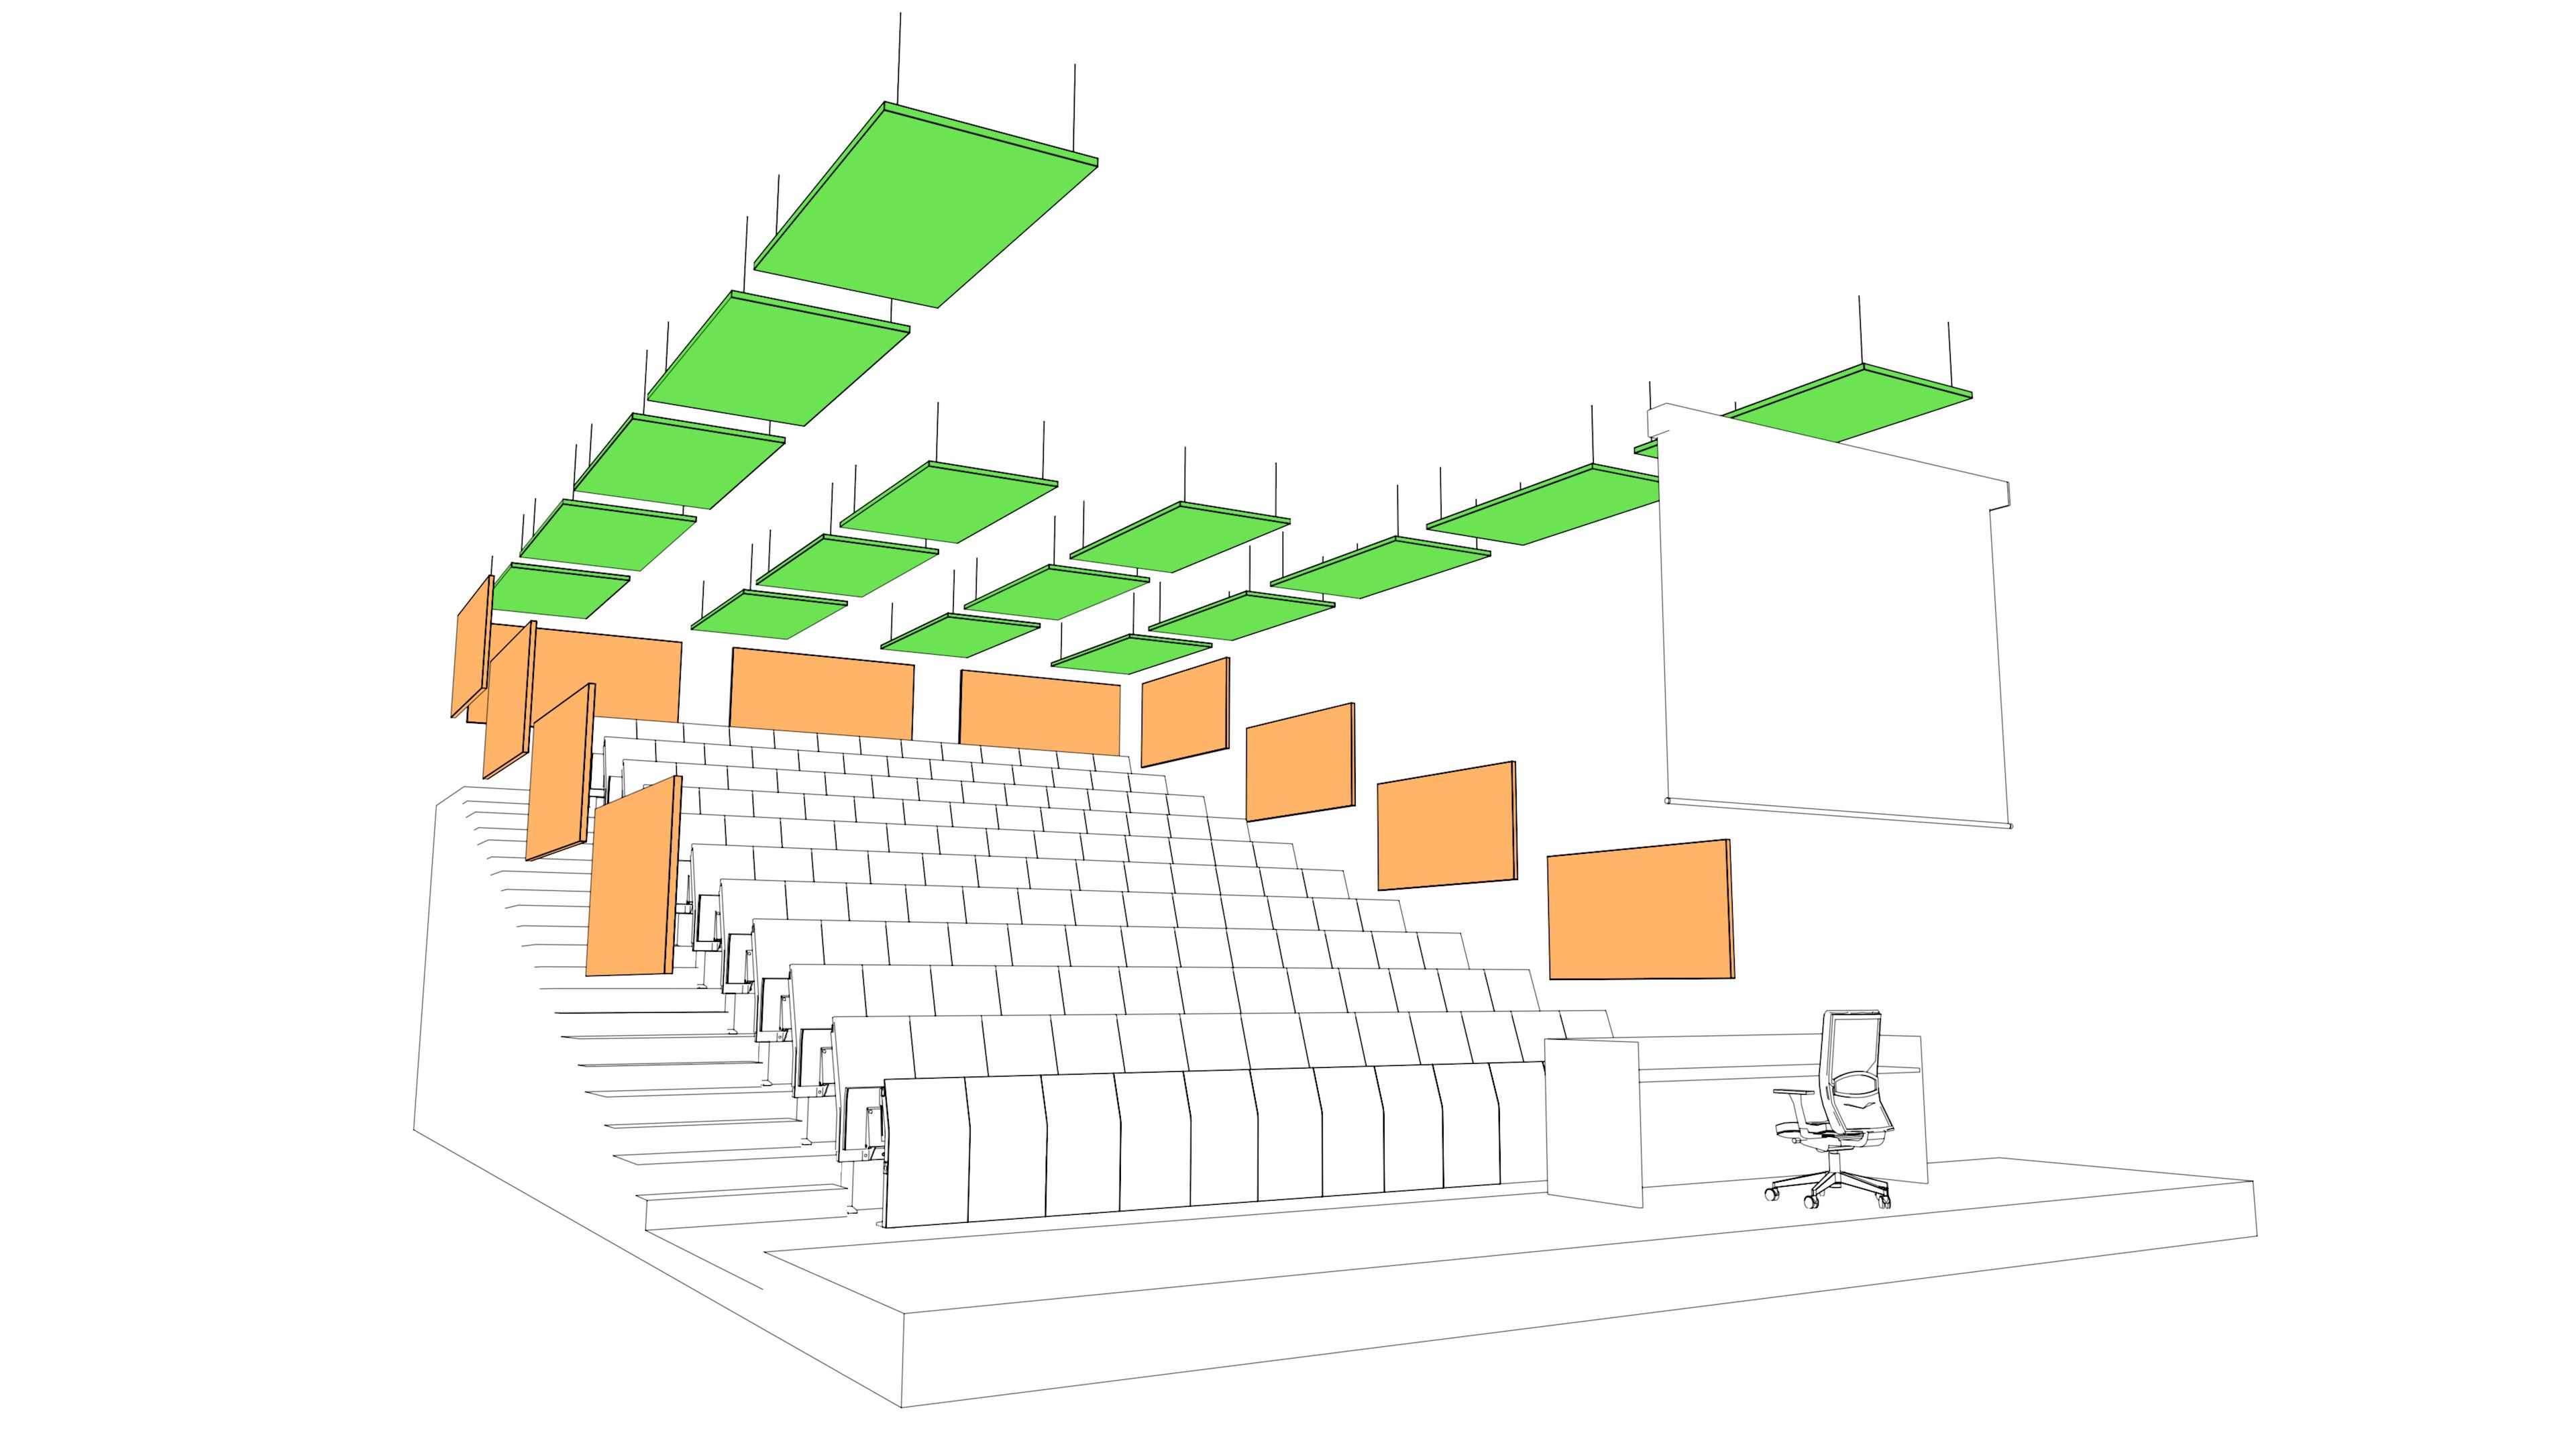 Distribuzioni pannelli fonoassorbenti aula didattica